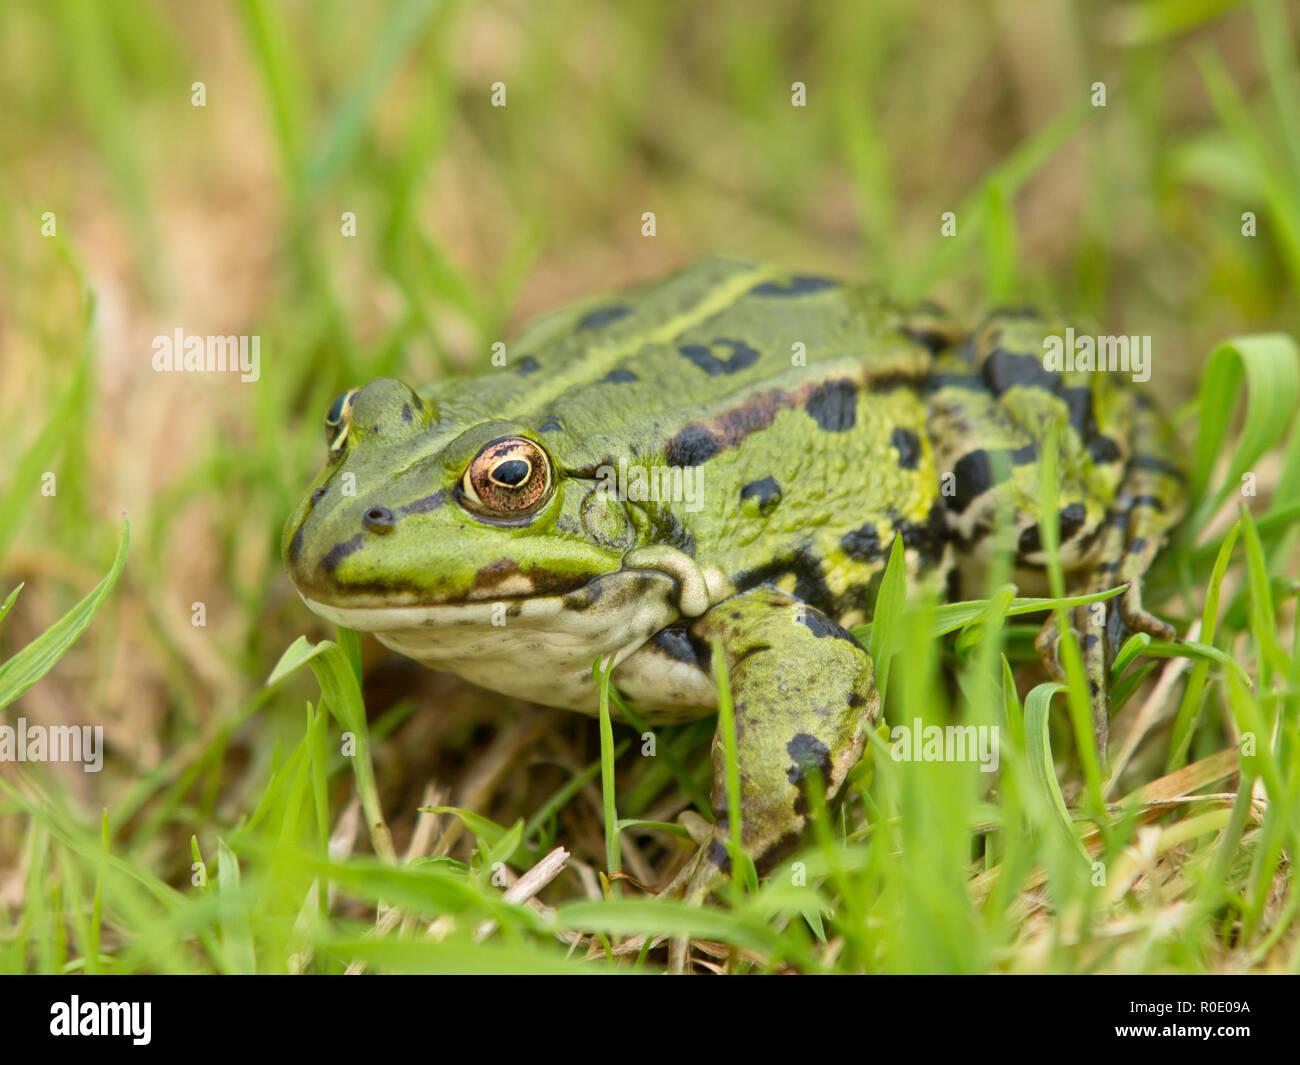 Edible Frog (Pelophylax kl. esculentus) sitting in grass - Stock Image